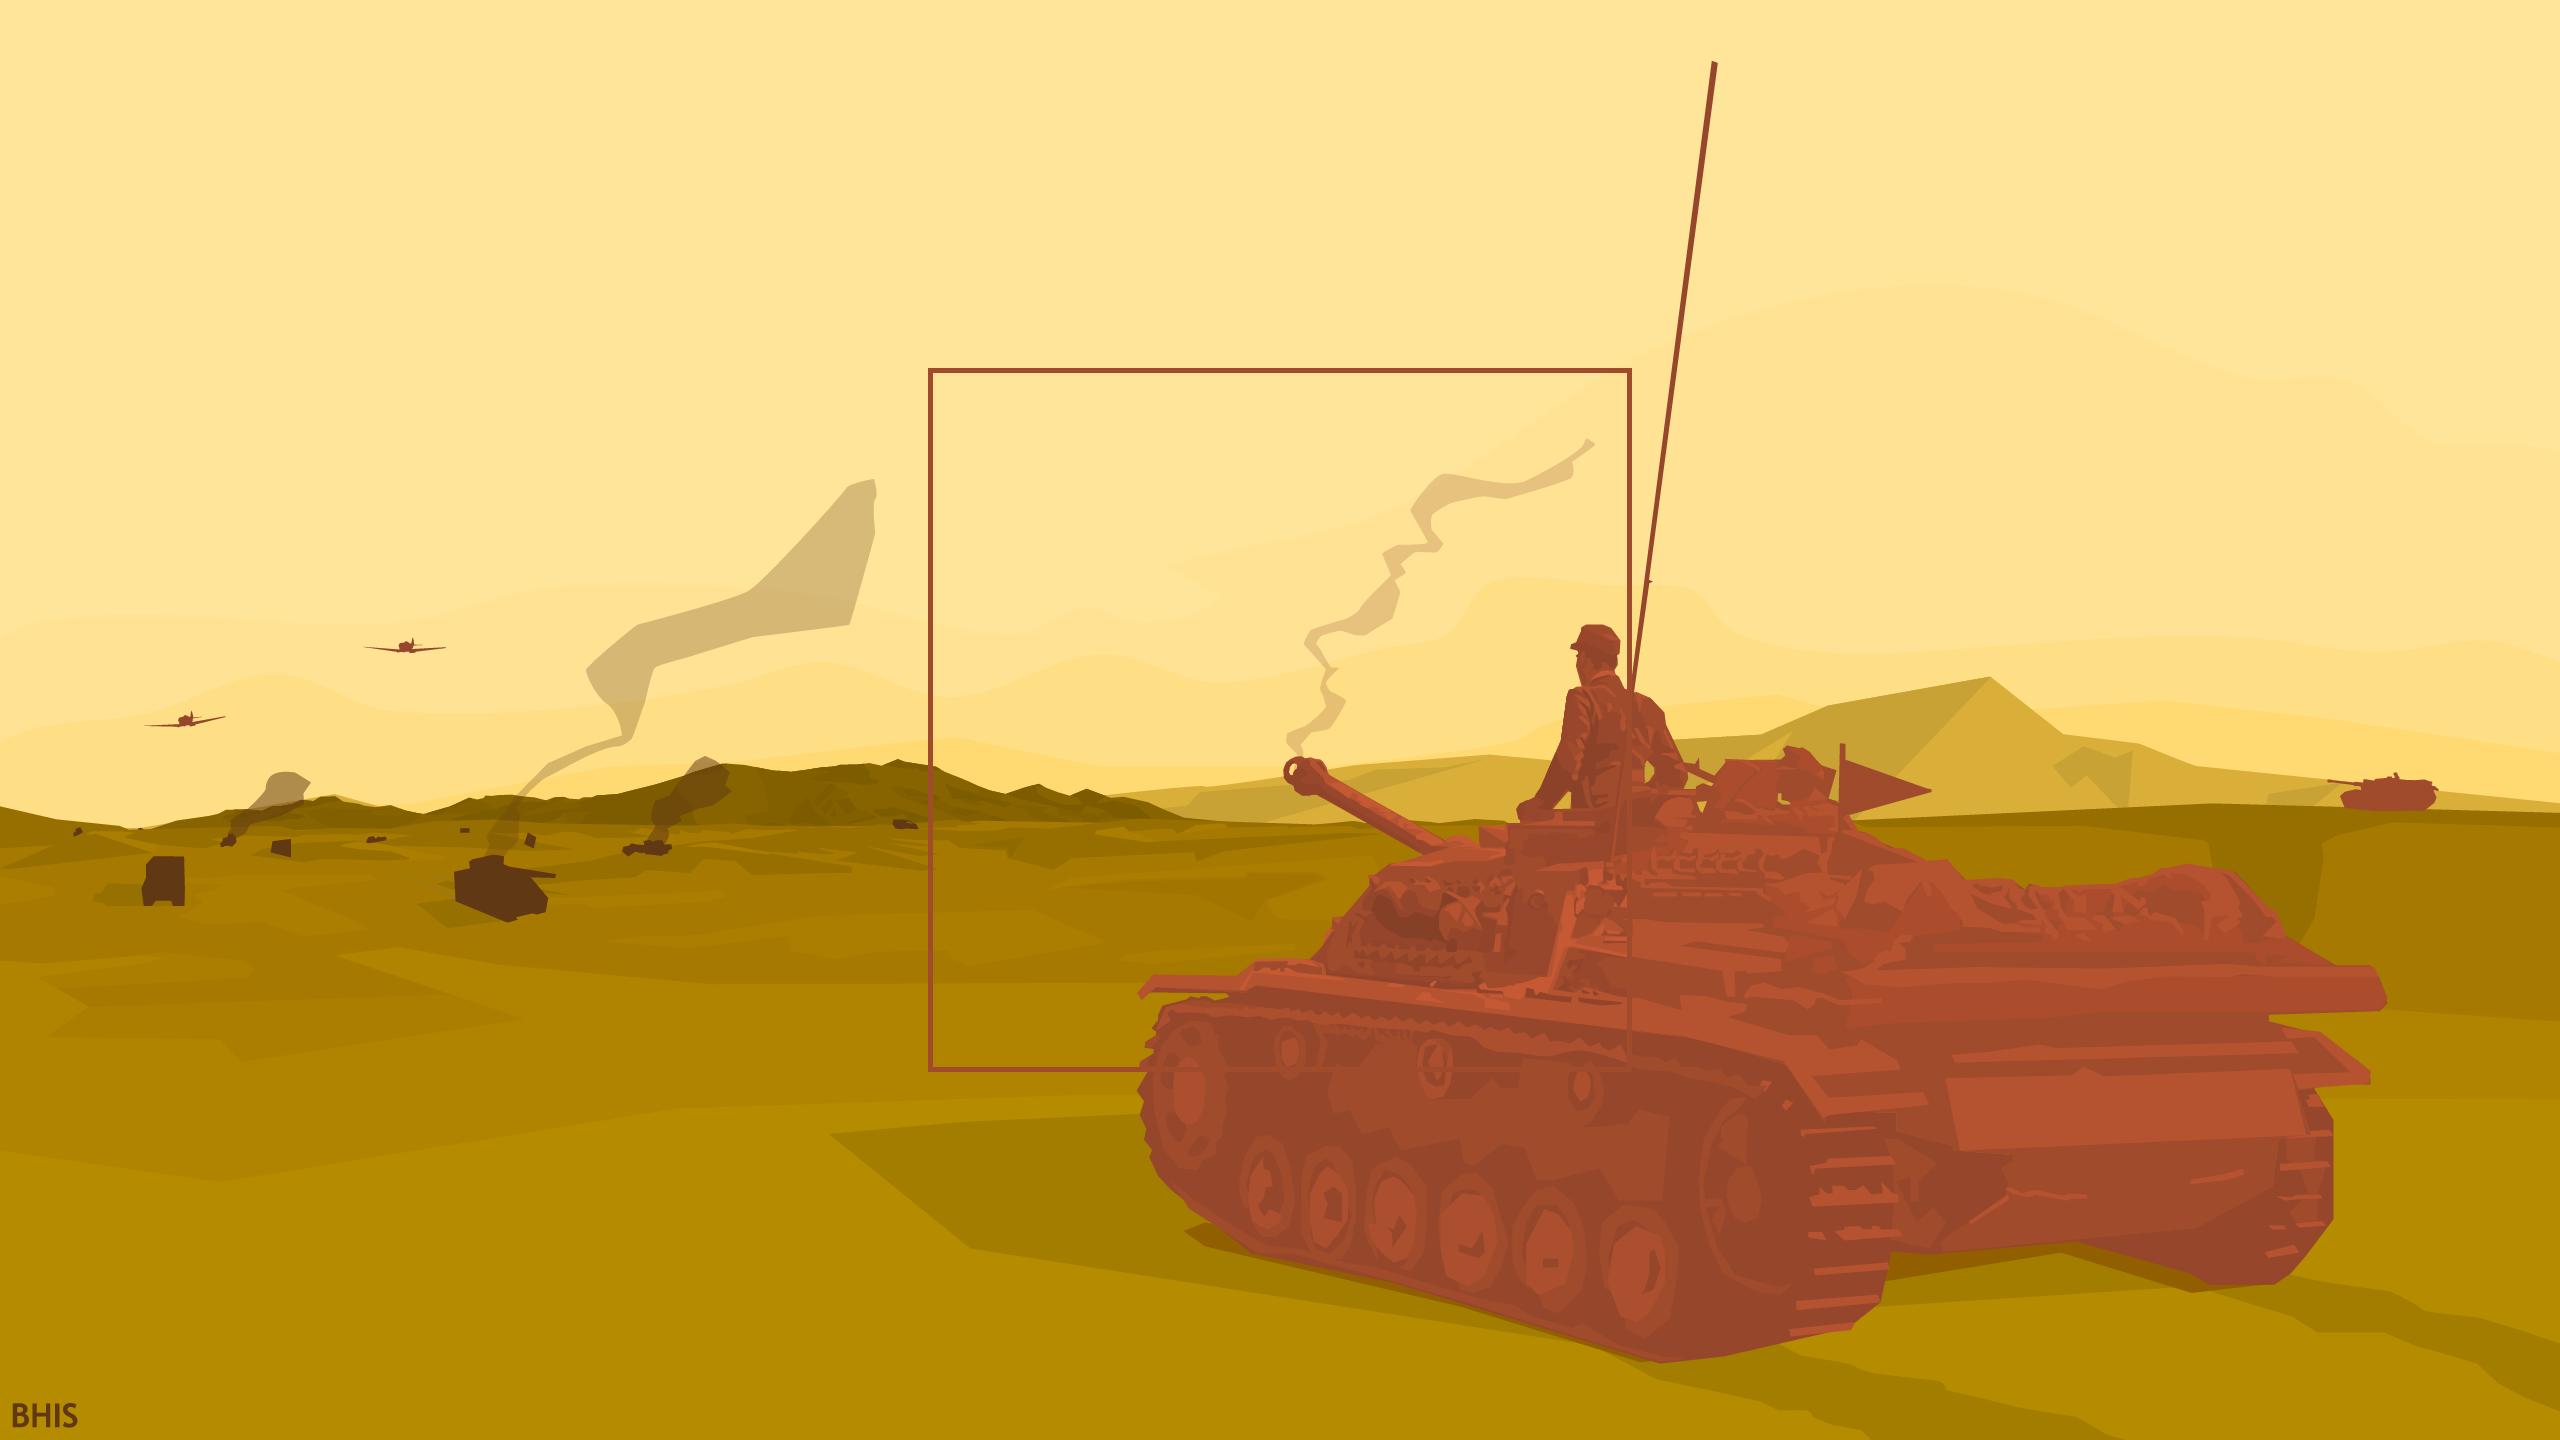 Wallpaper Ilustrasi Seni Digital Minimalis Kendaraan